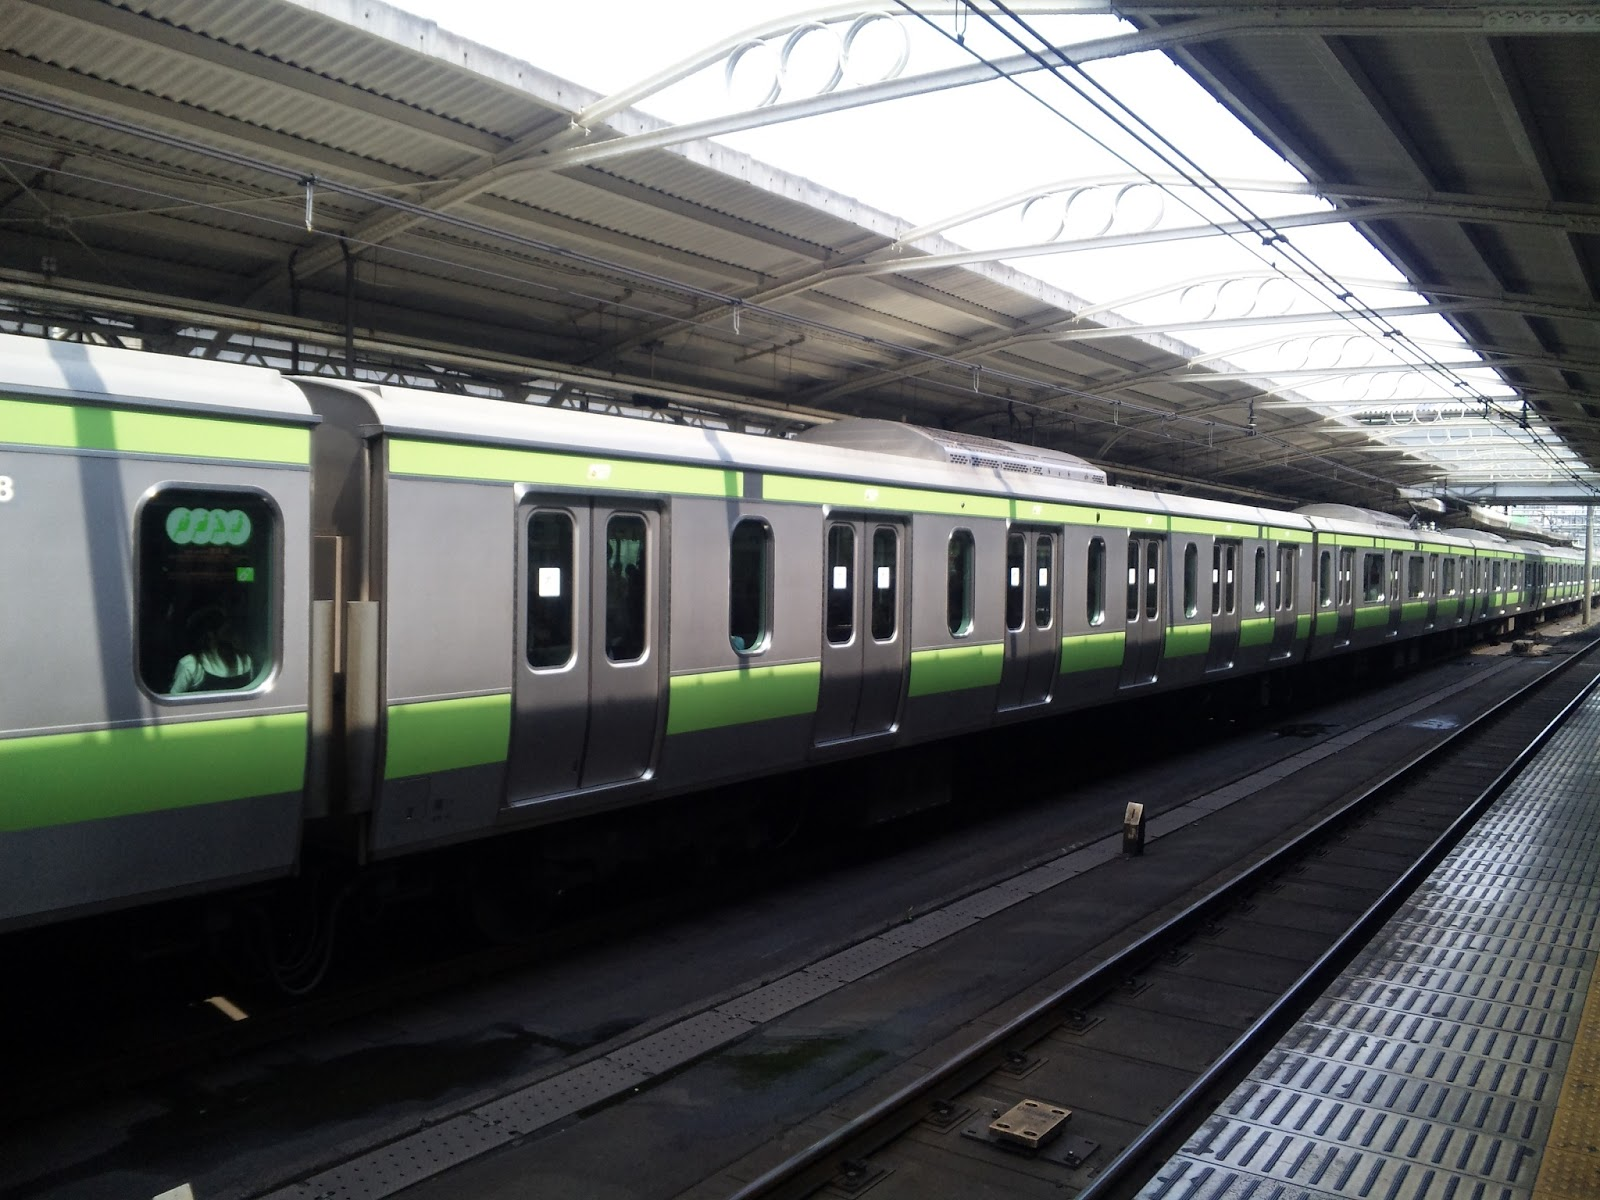 山手線E231系500番台の6扉車